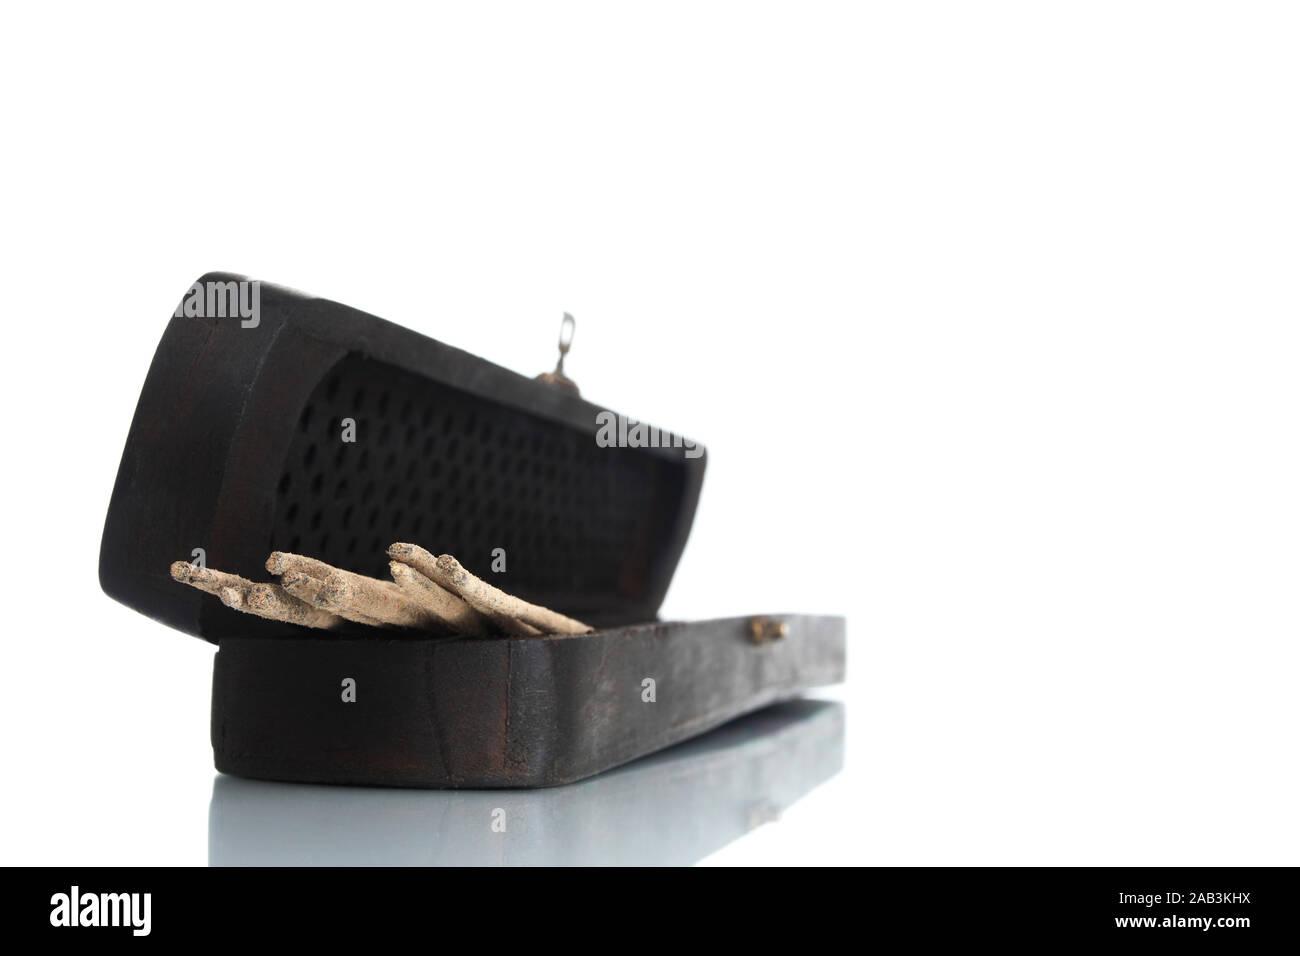 Holzkästchen mit Räucherstäbchen Stock Photo